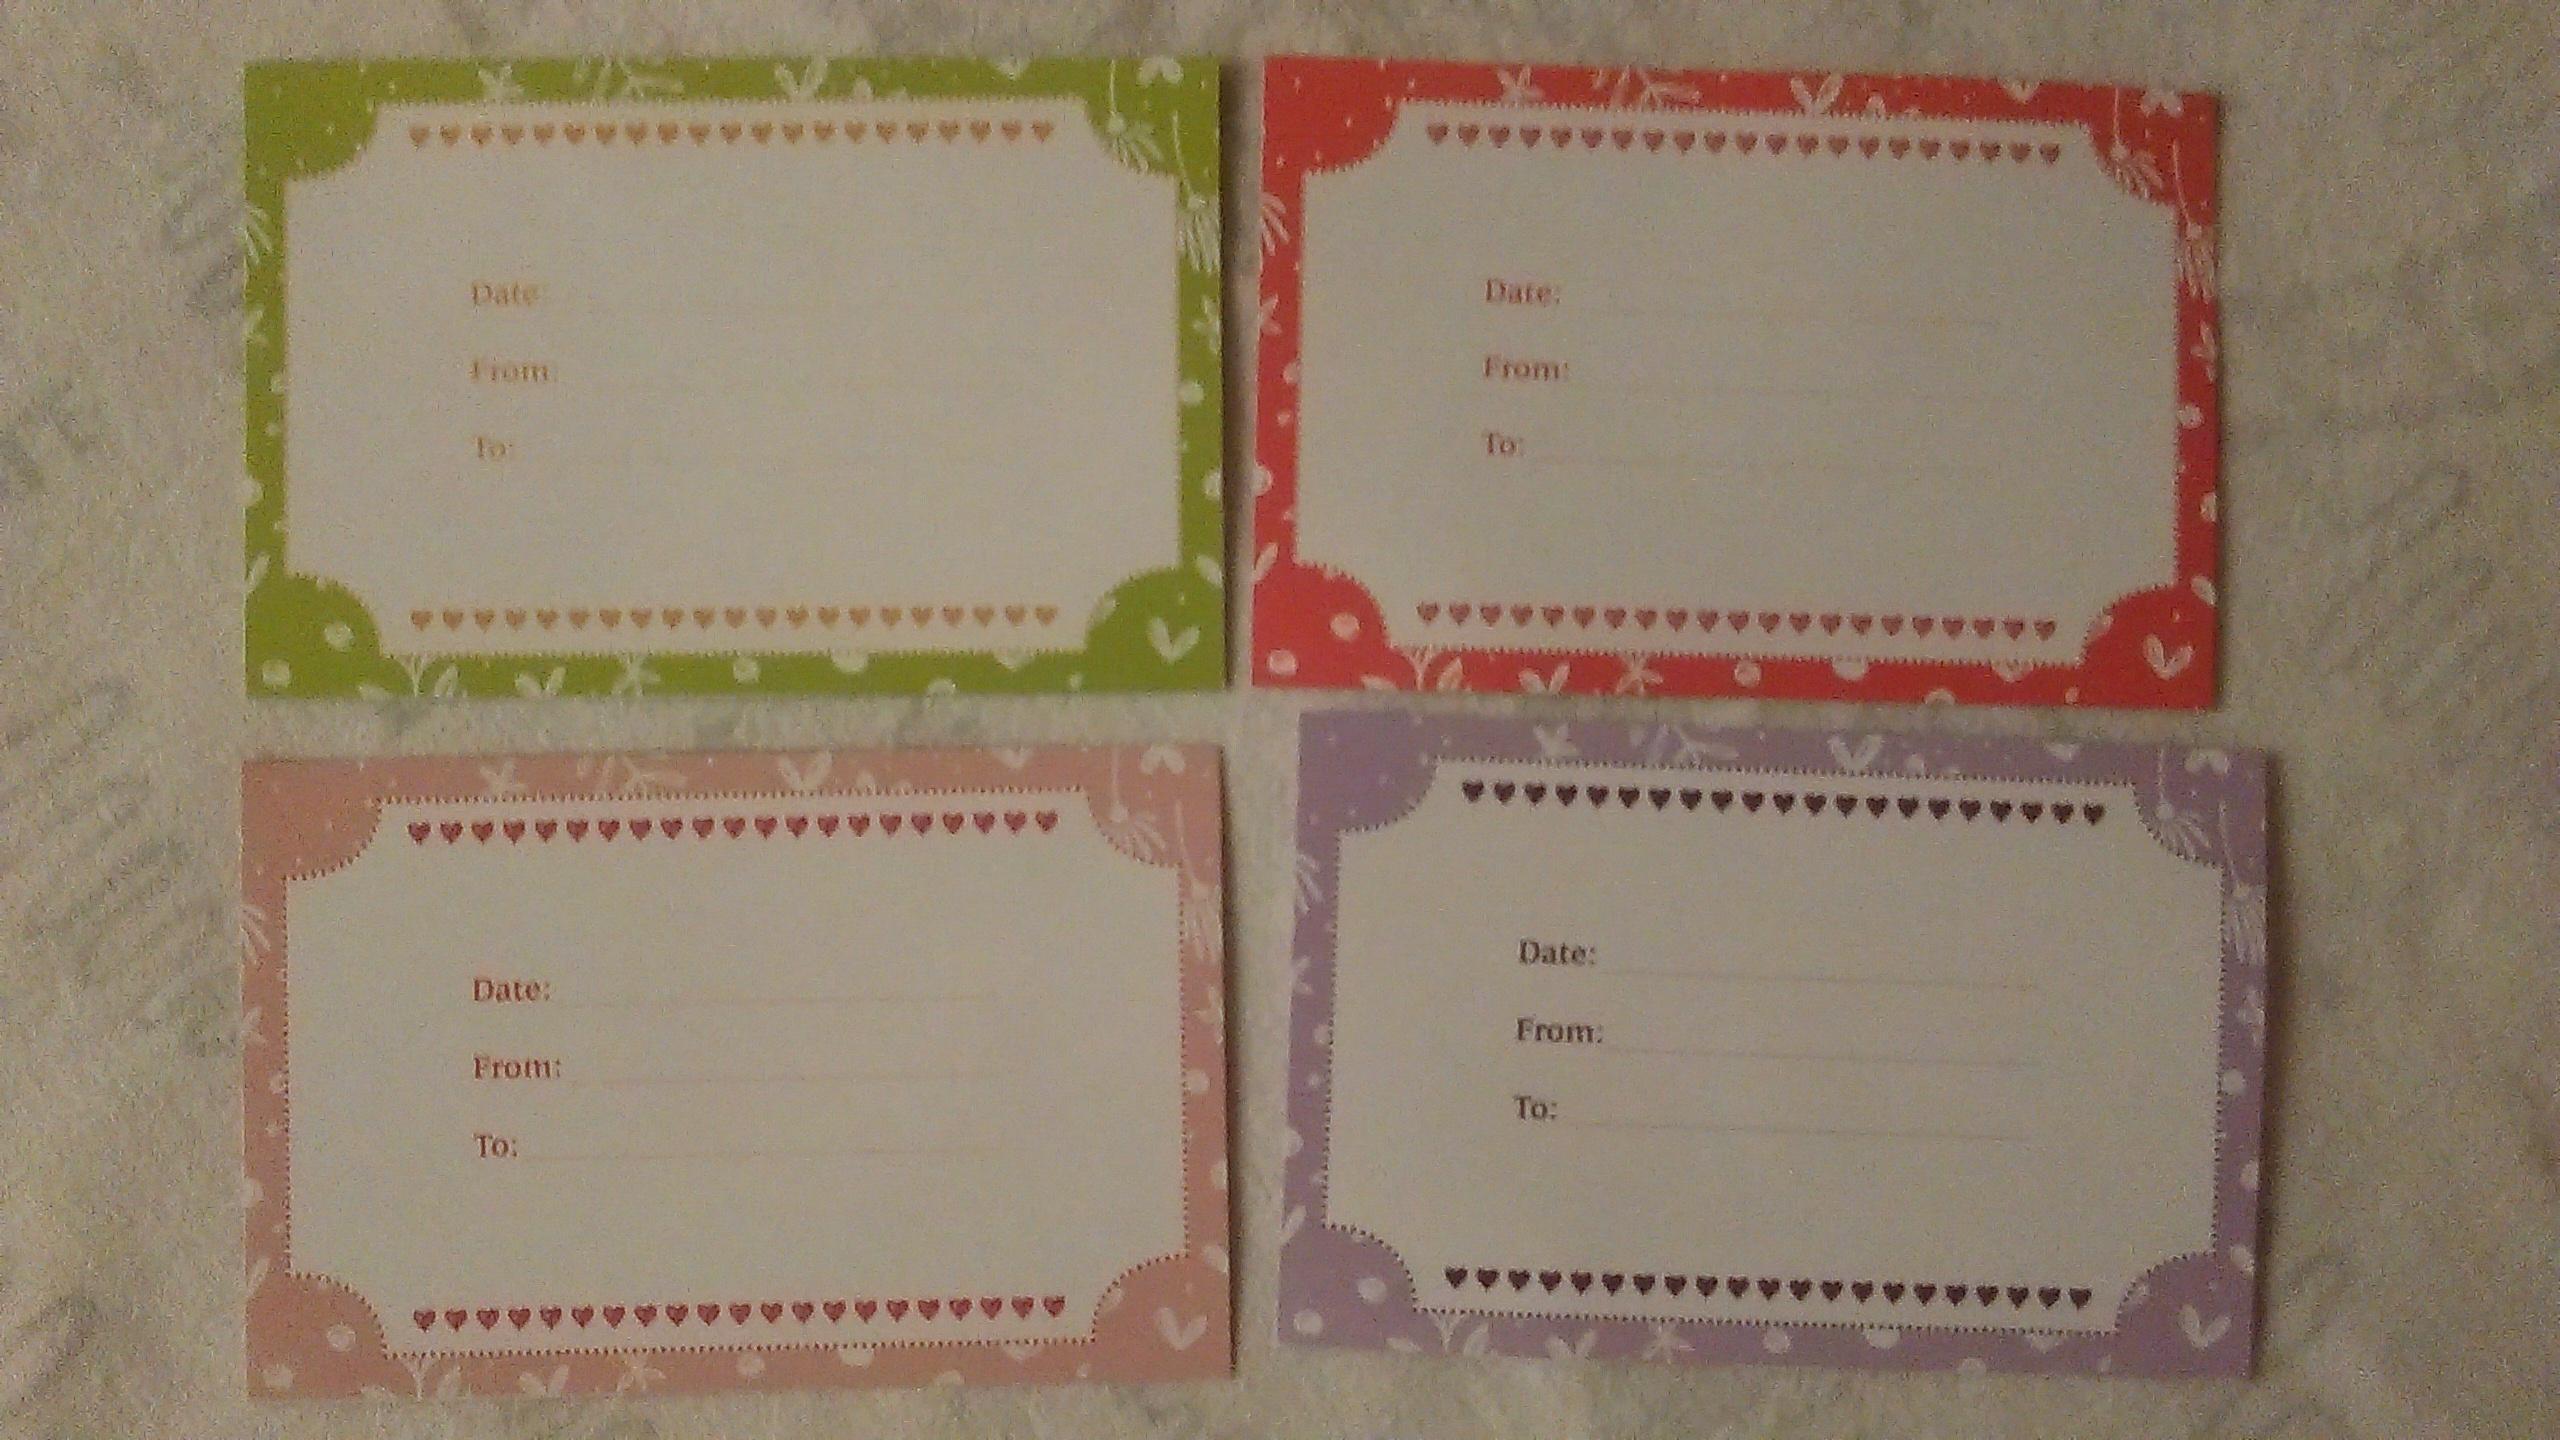 troc de troc 4 cartes-bons recto/verso. image 1